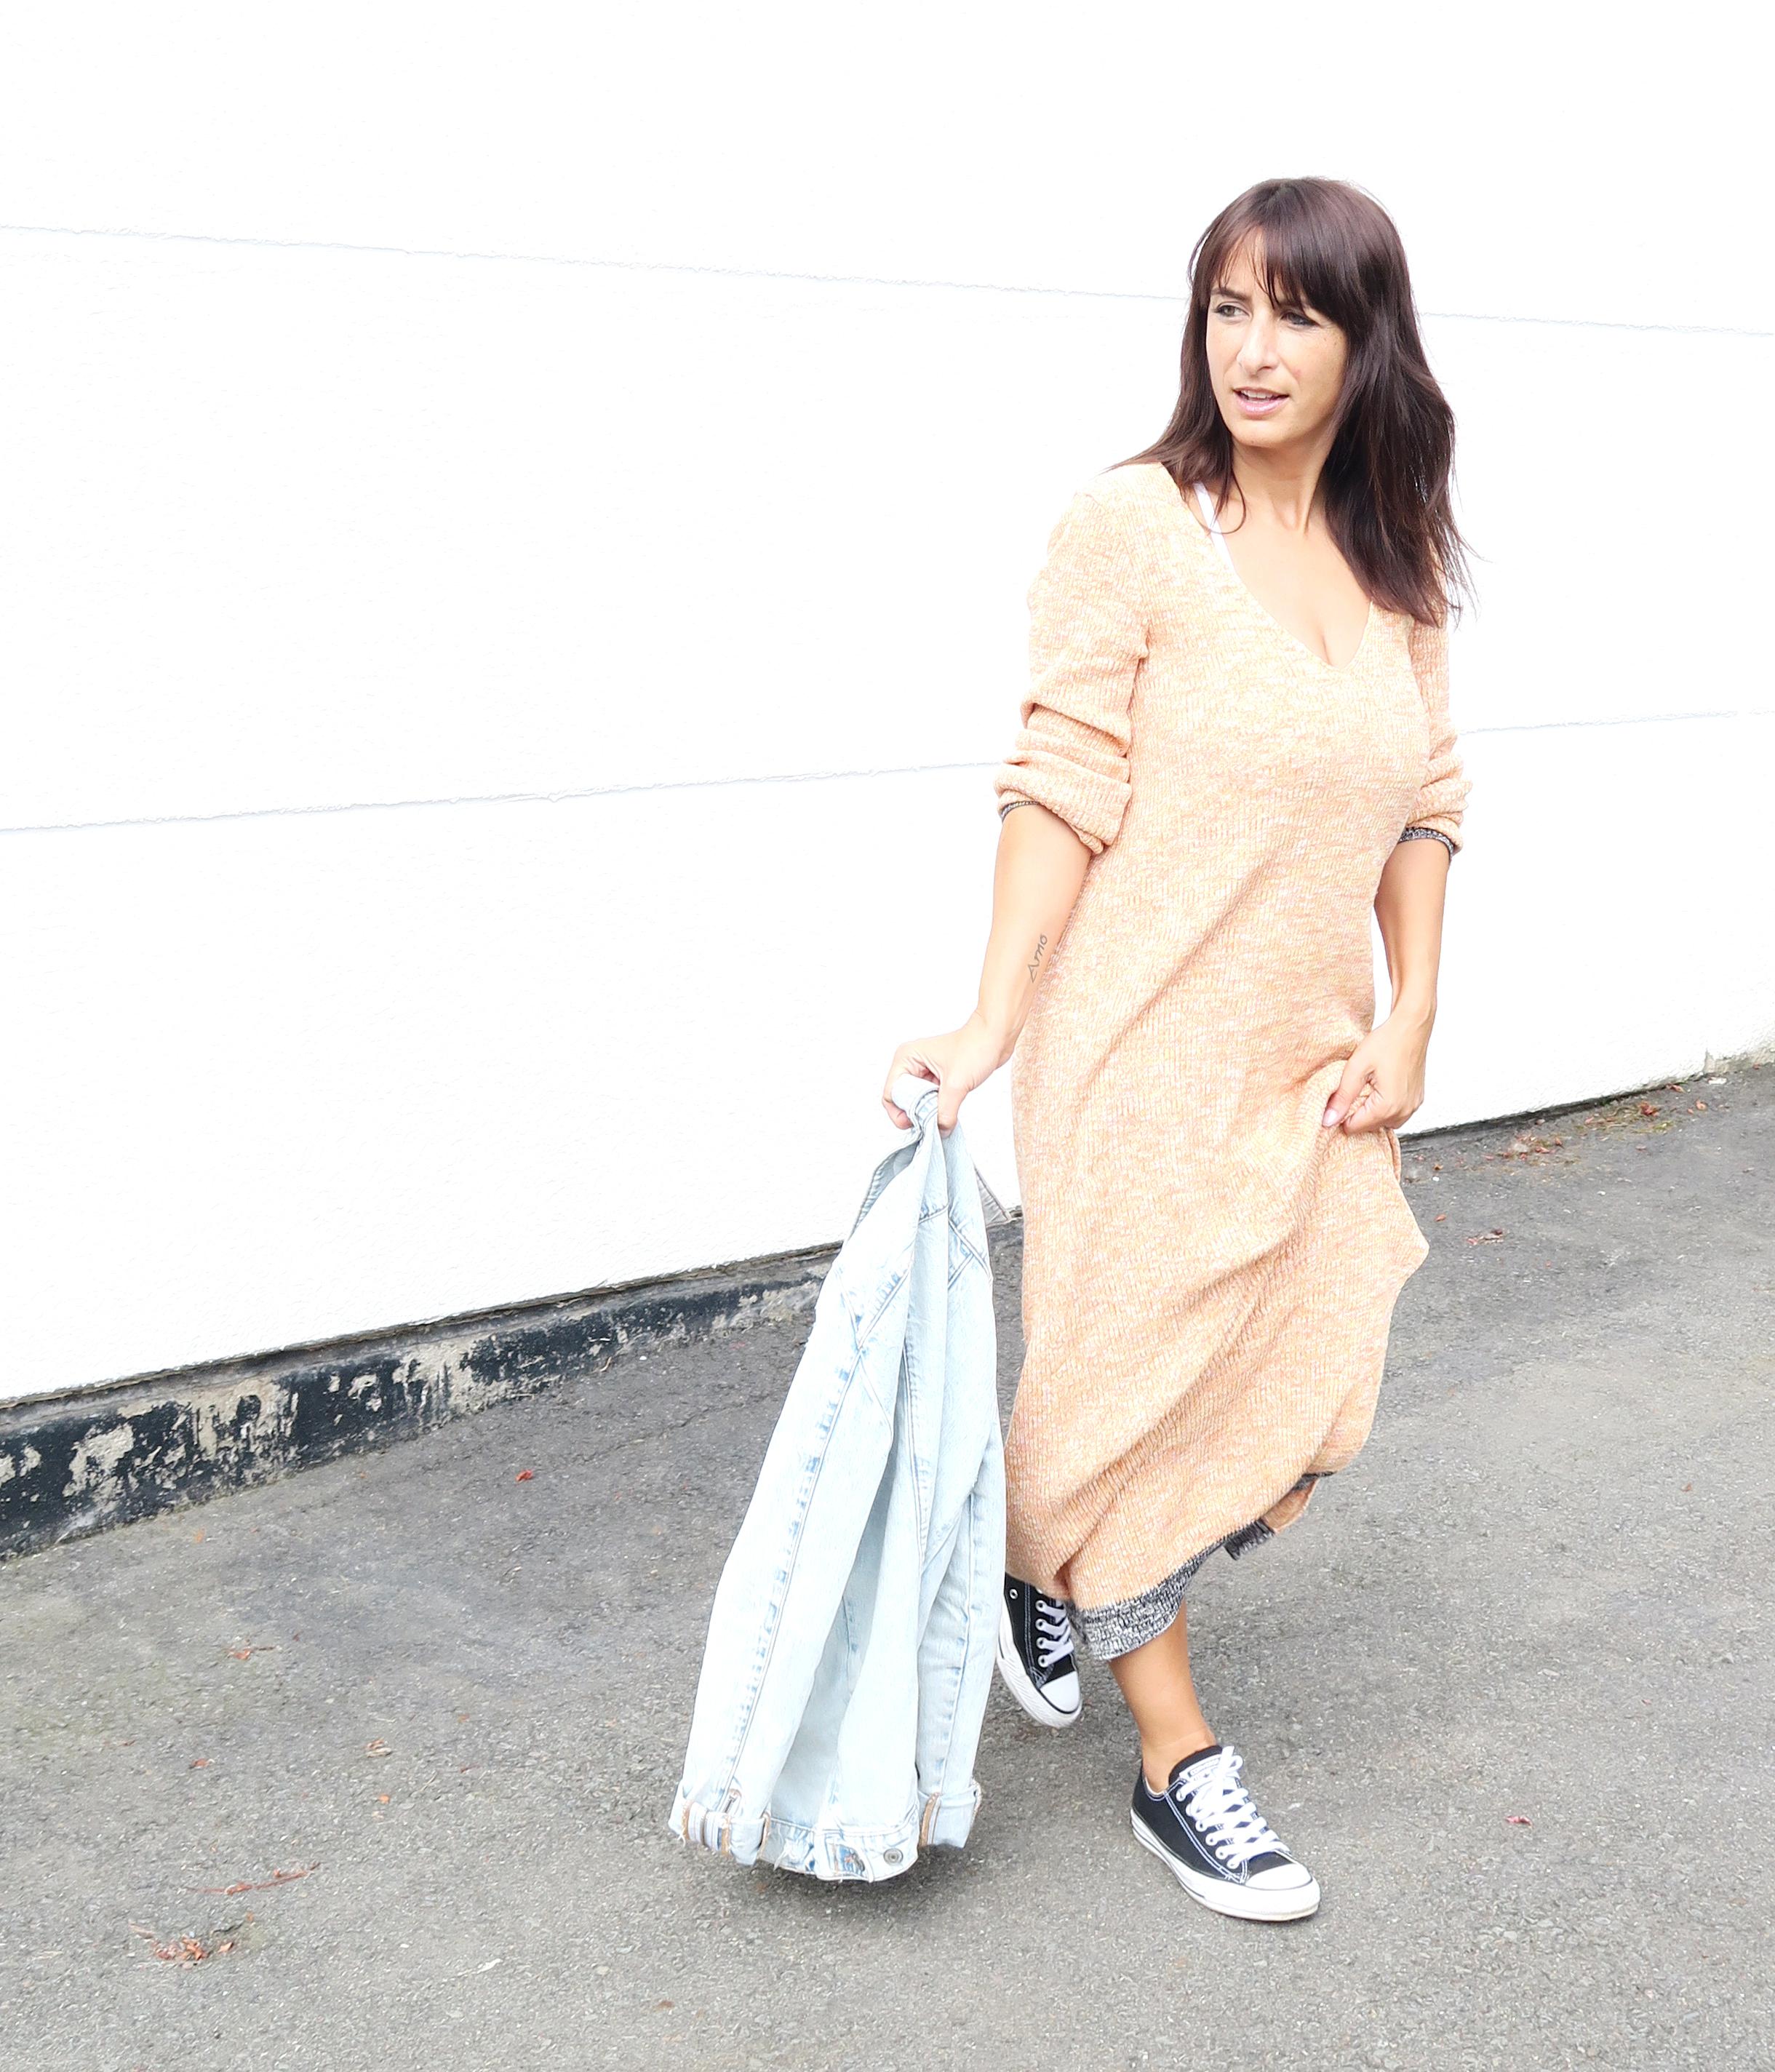 Modesalat-Blogger-Fashionblogger-Modeblogger-Streetstyle-Dress-Converse-2